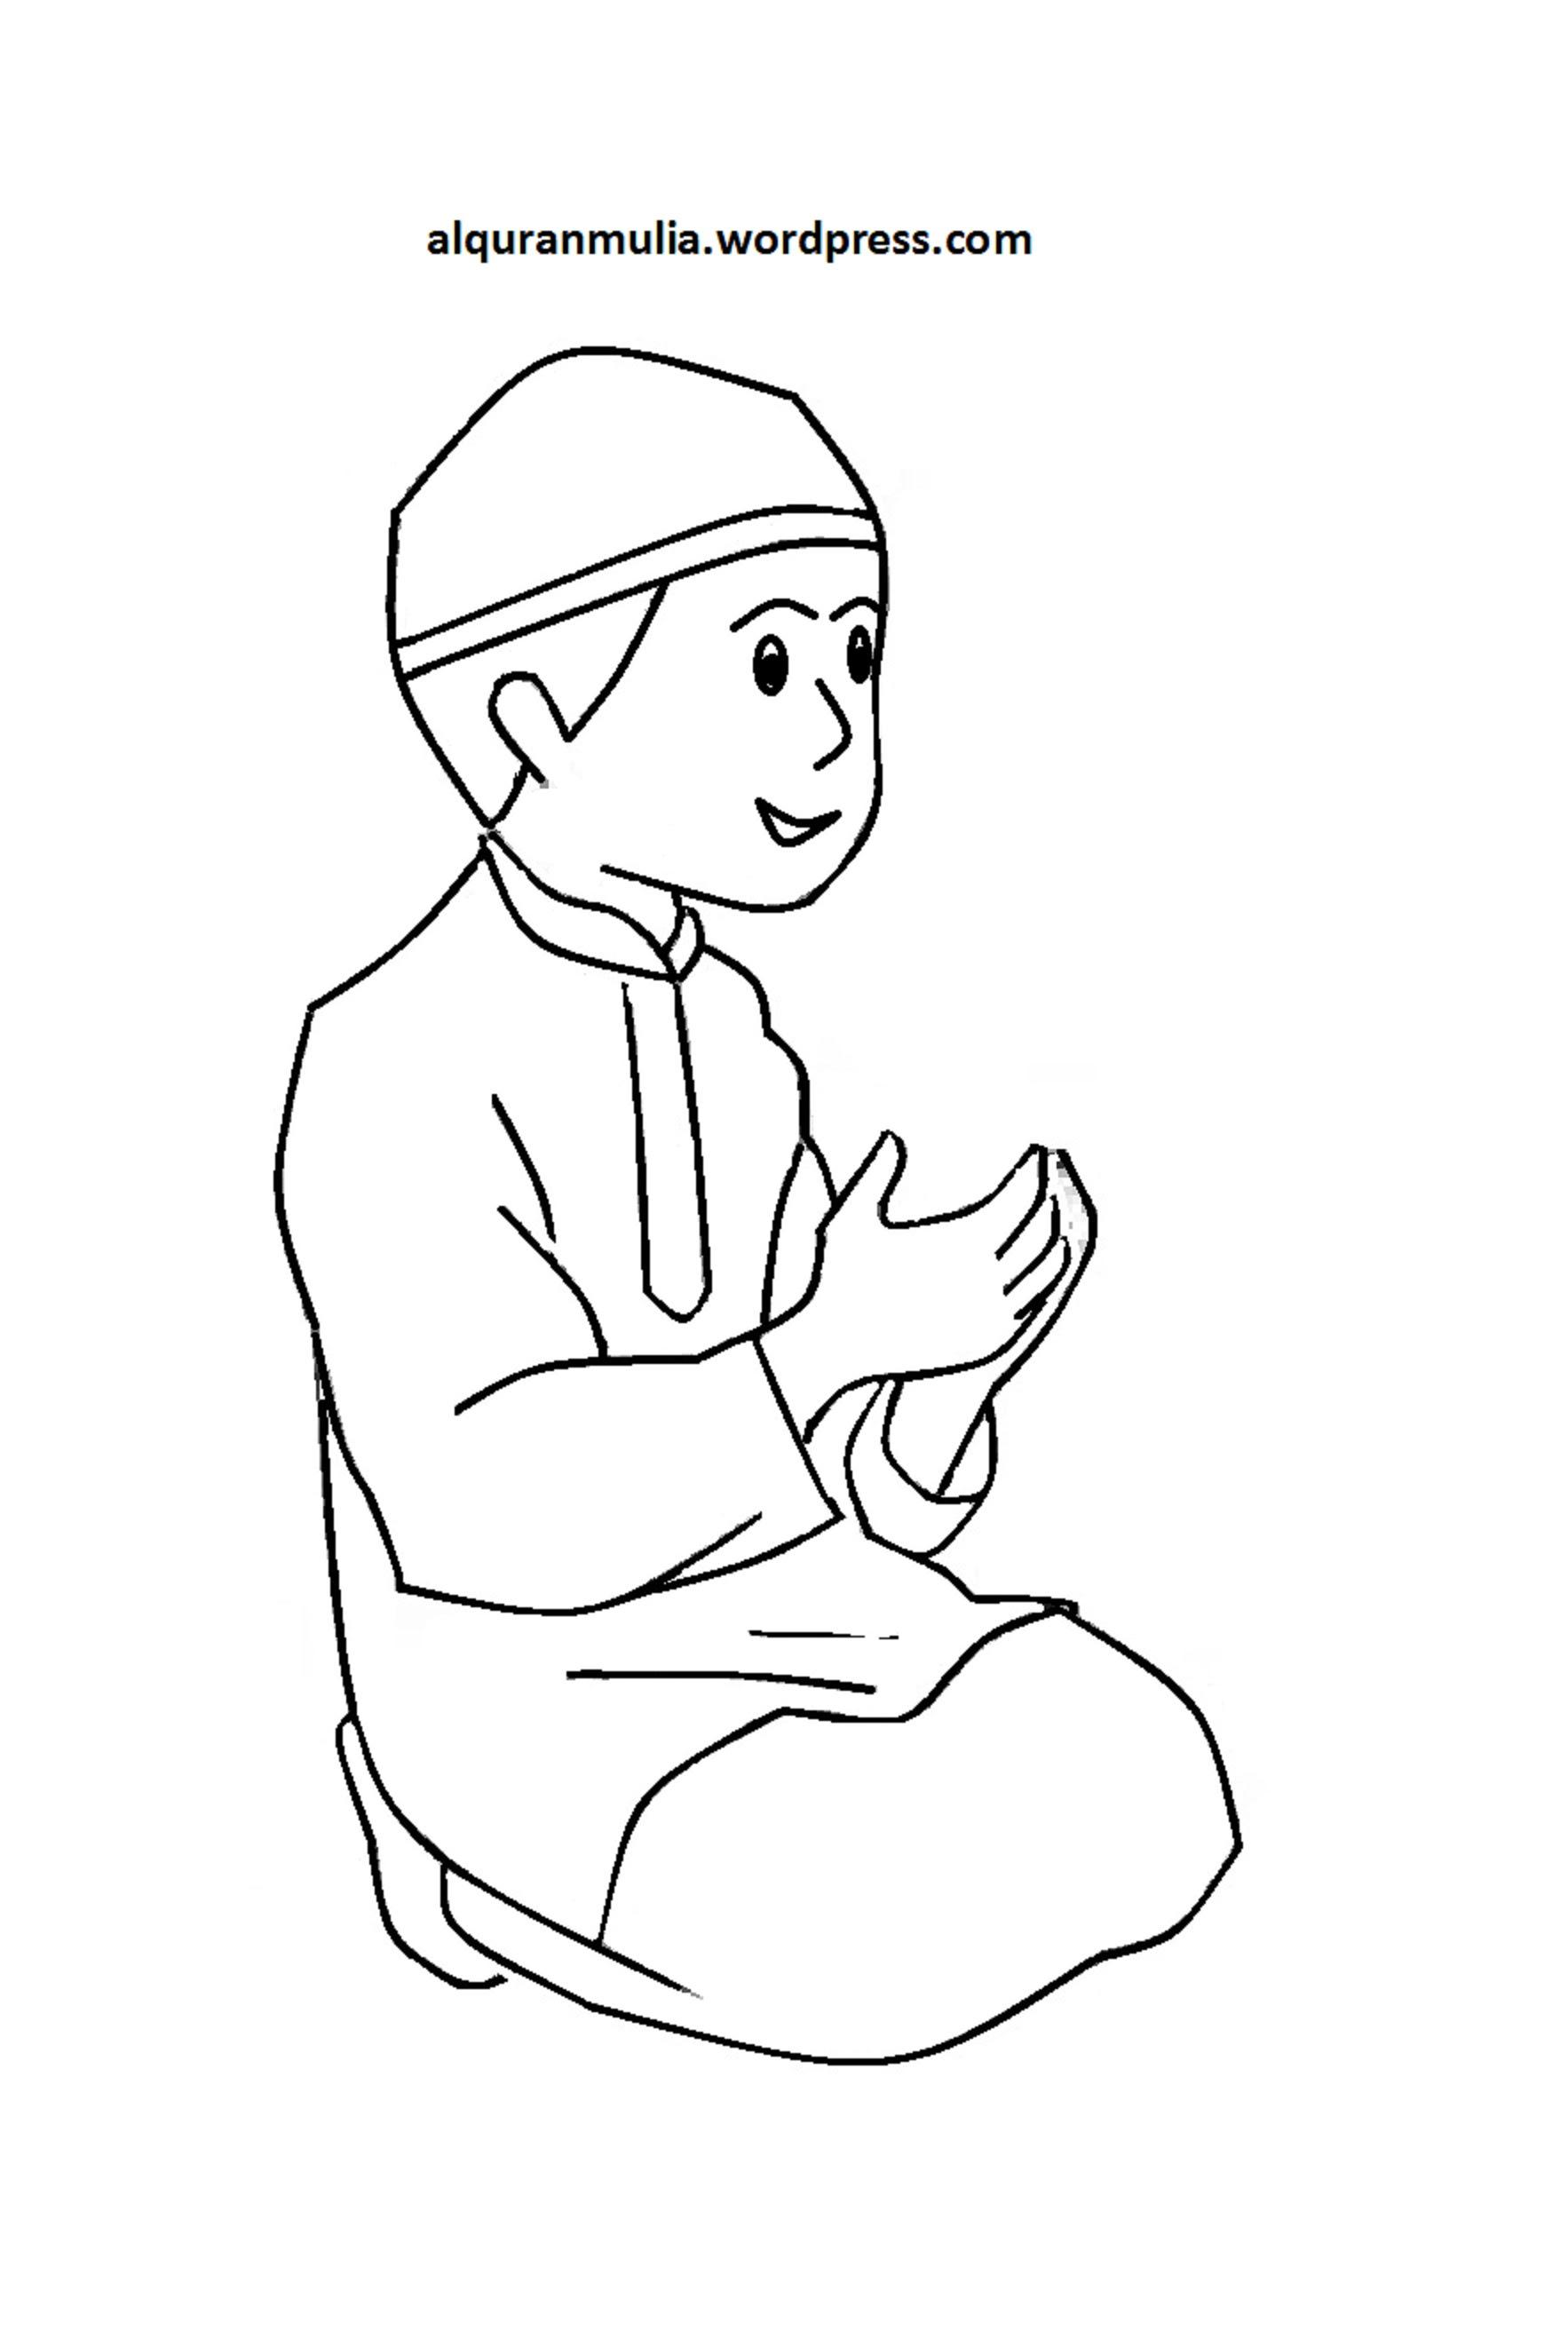 Mewarnai Gambar Mewarnai Gambar Sketsa Kartun Anak Muslimah 2 Auto